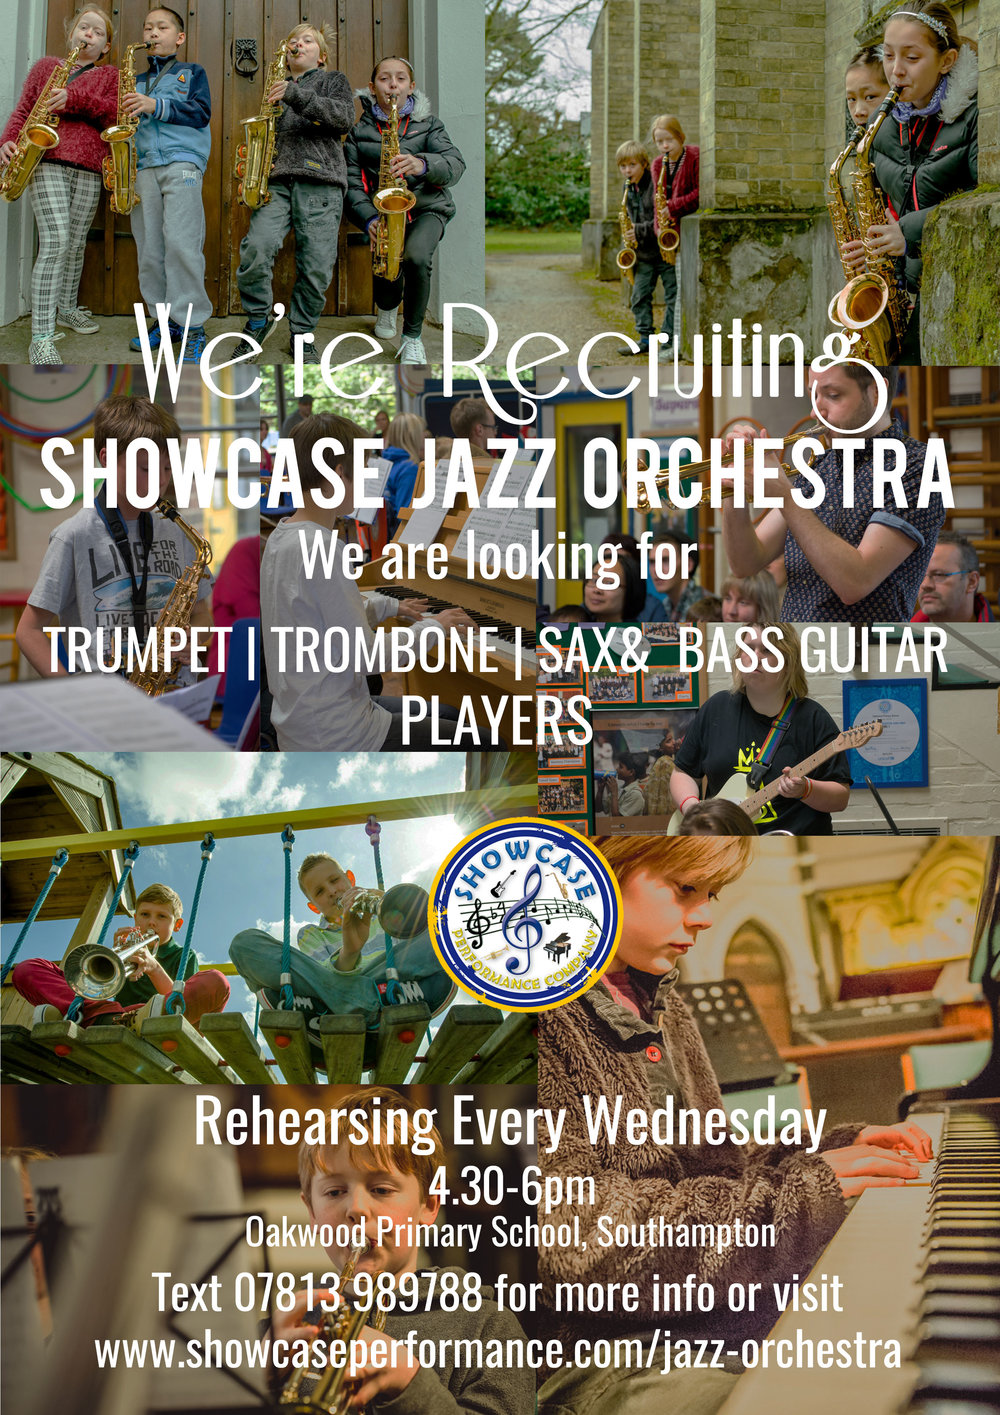 Advert - Recruiting - Jazz Orchestra.jpg